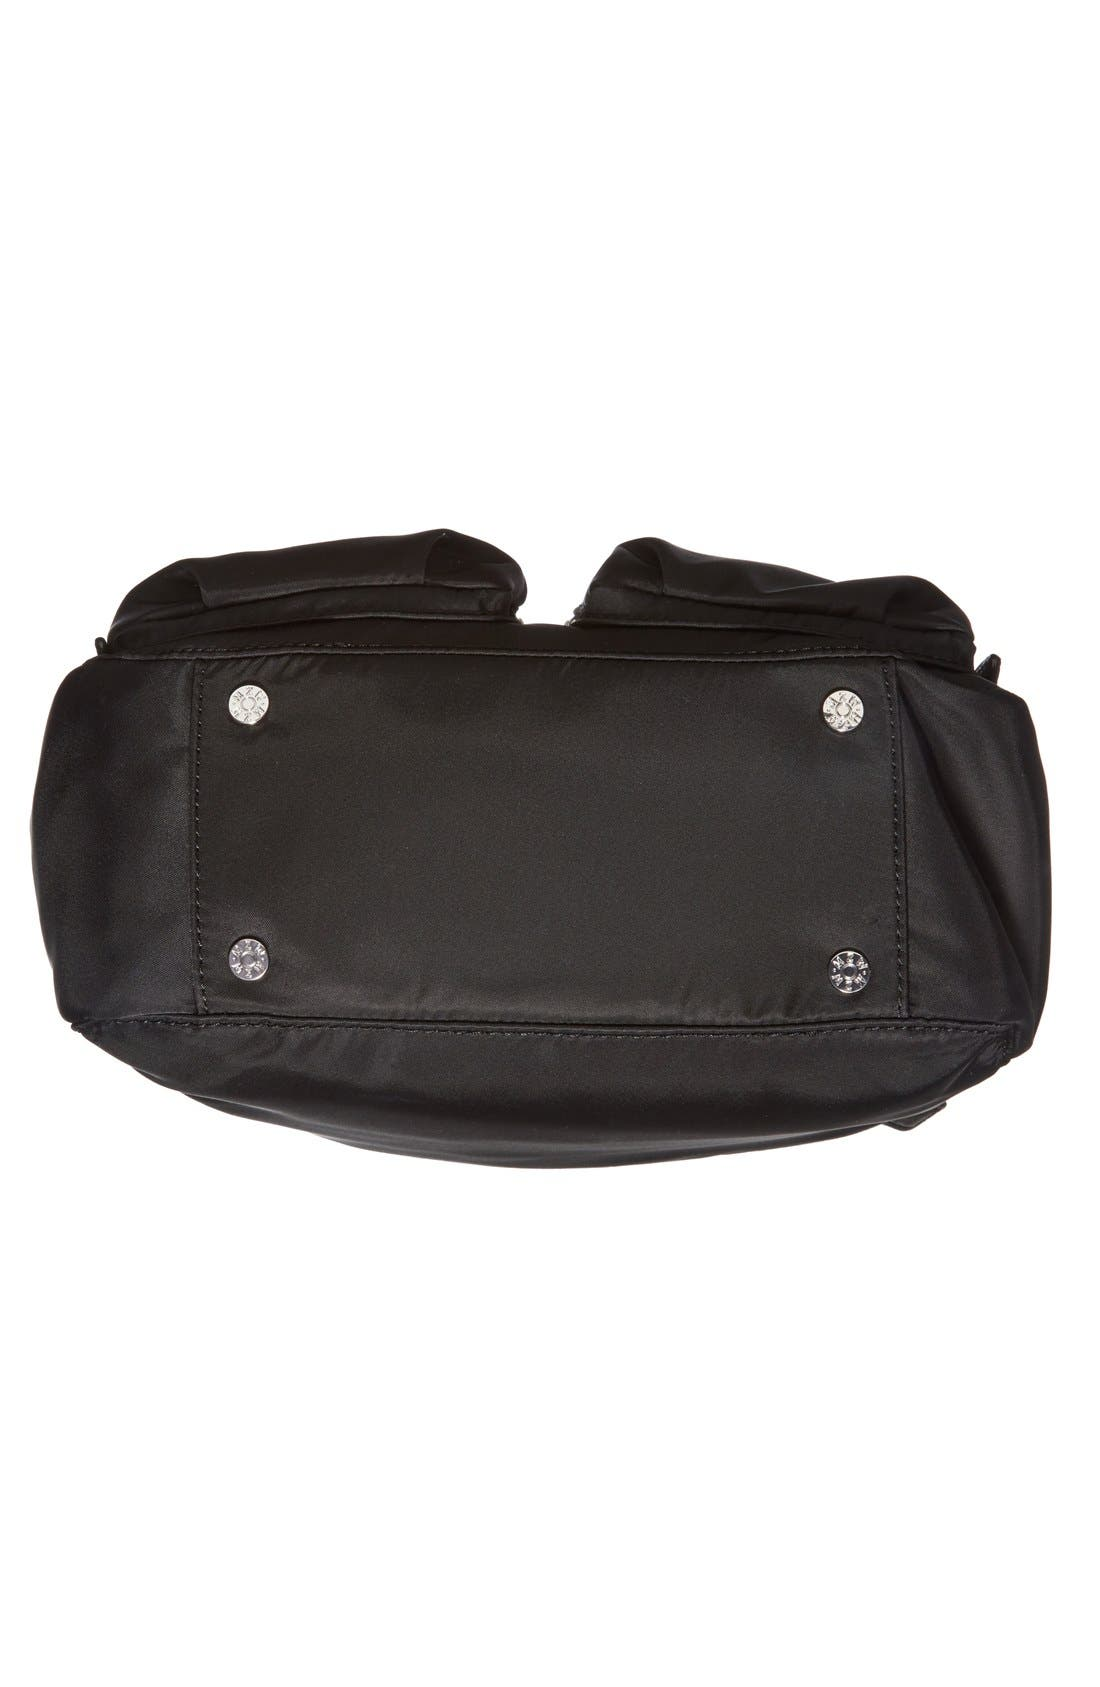 'Small Roxy' Bedford Nylon Shoulder Bag,                             Alternate thumbnail 6, color,                             001